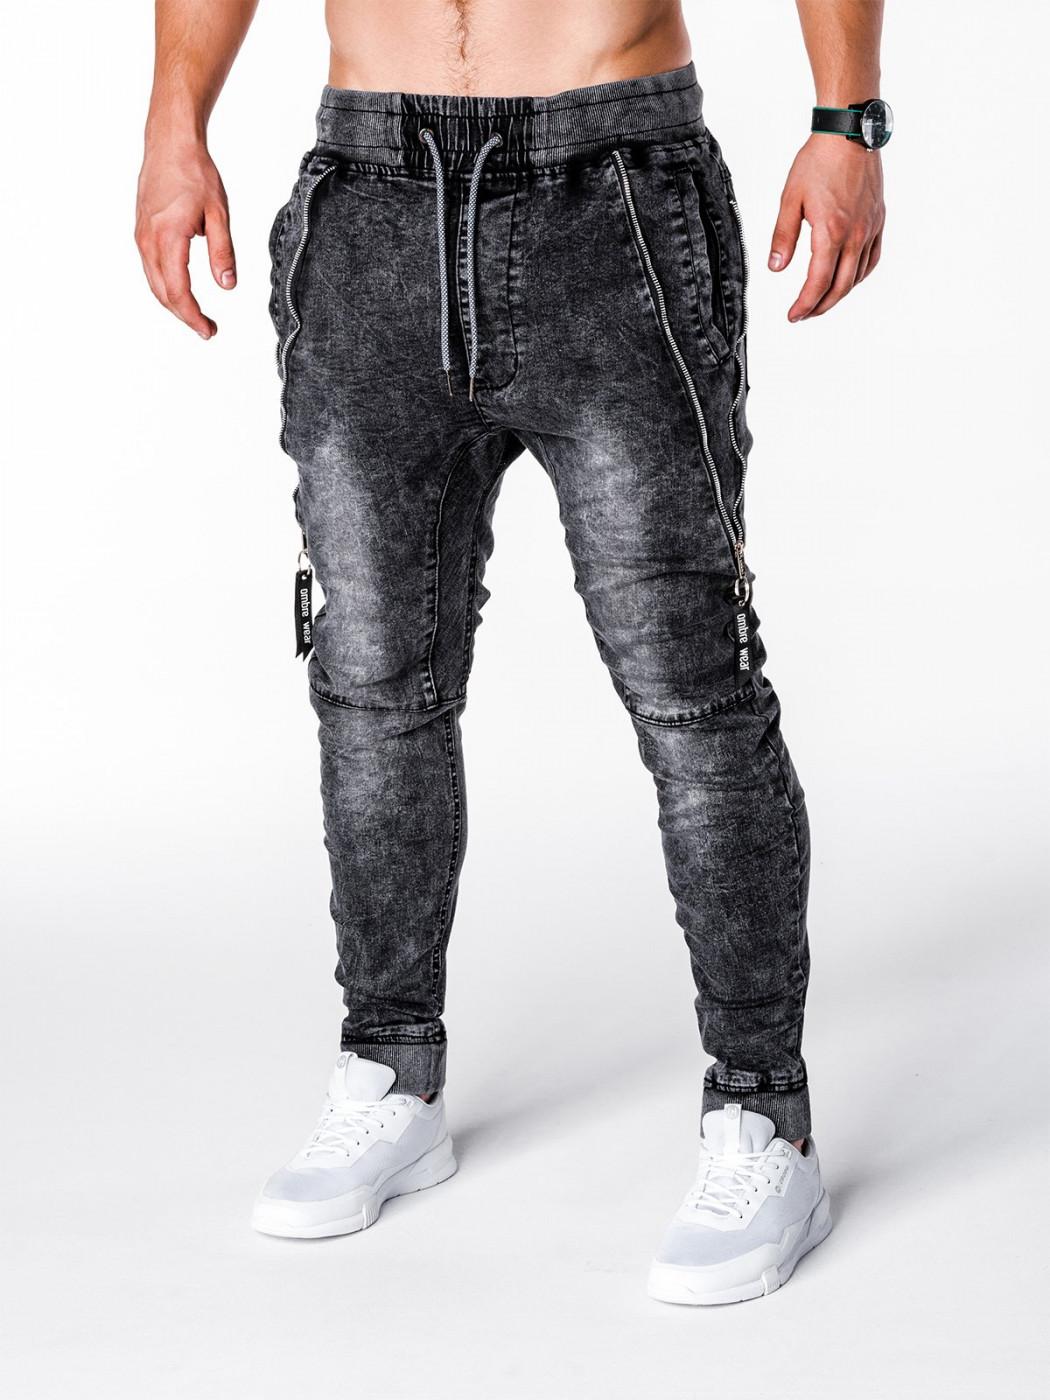 Ombre Clothing Men's jeans joggers P647